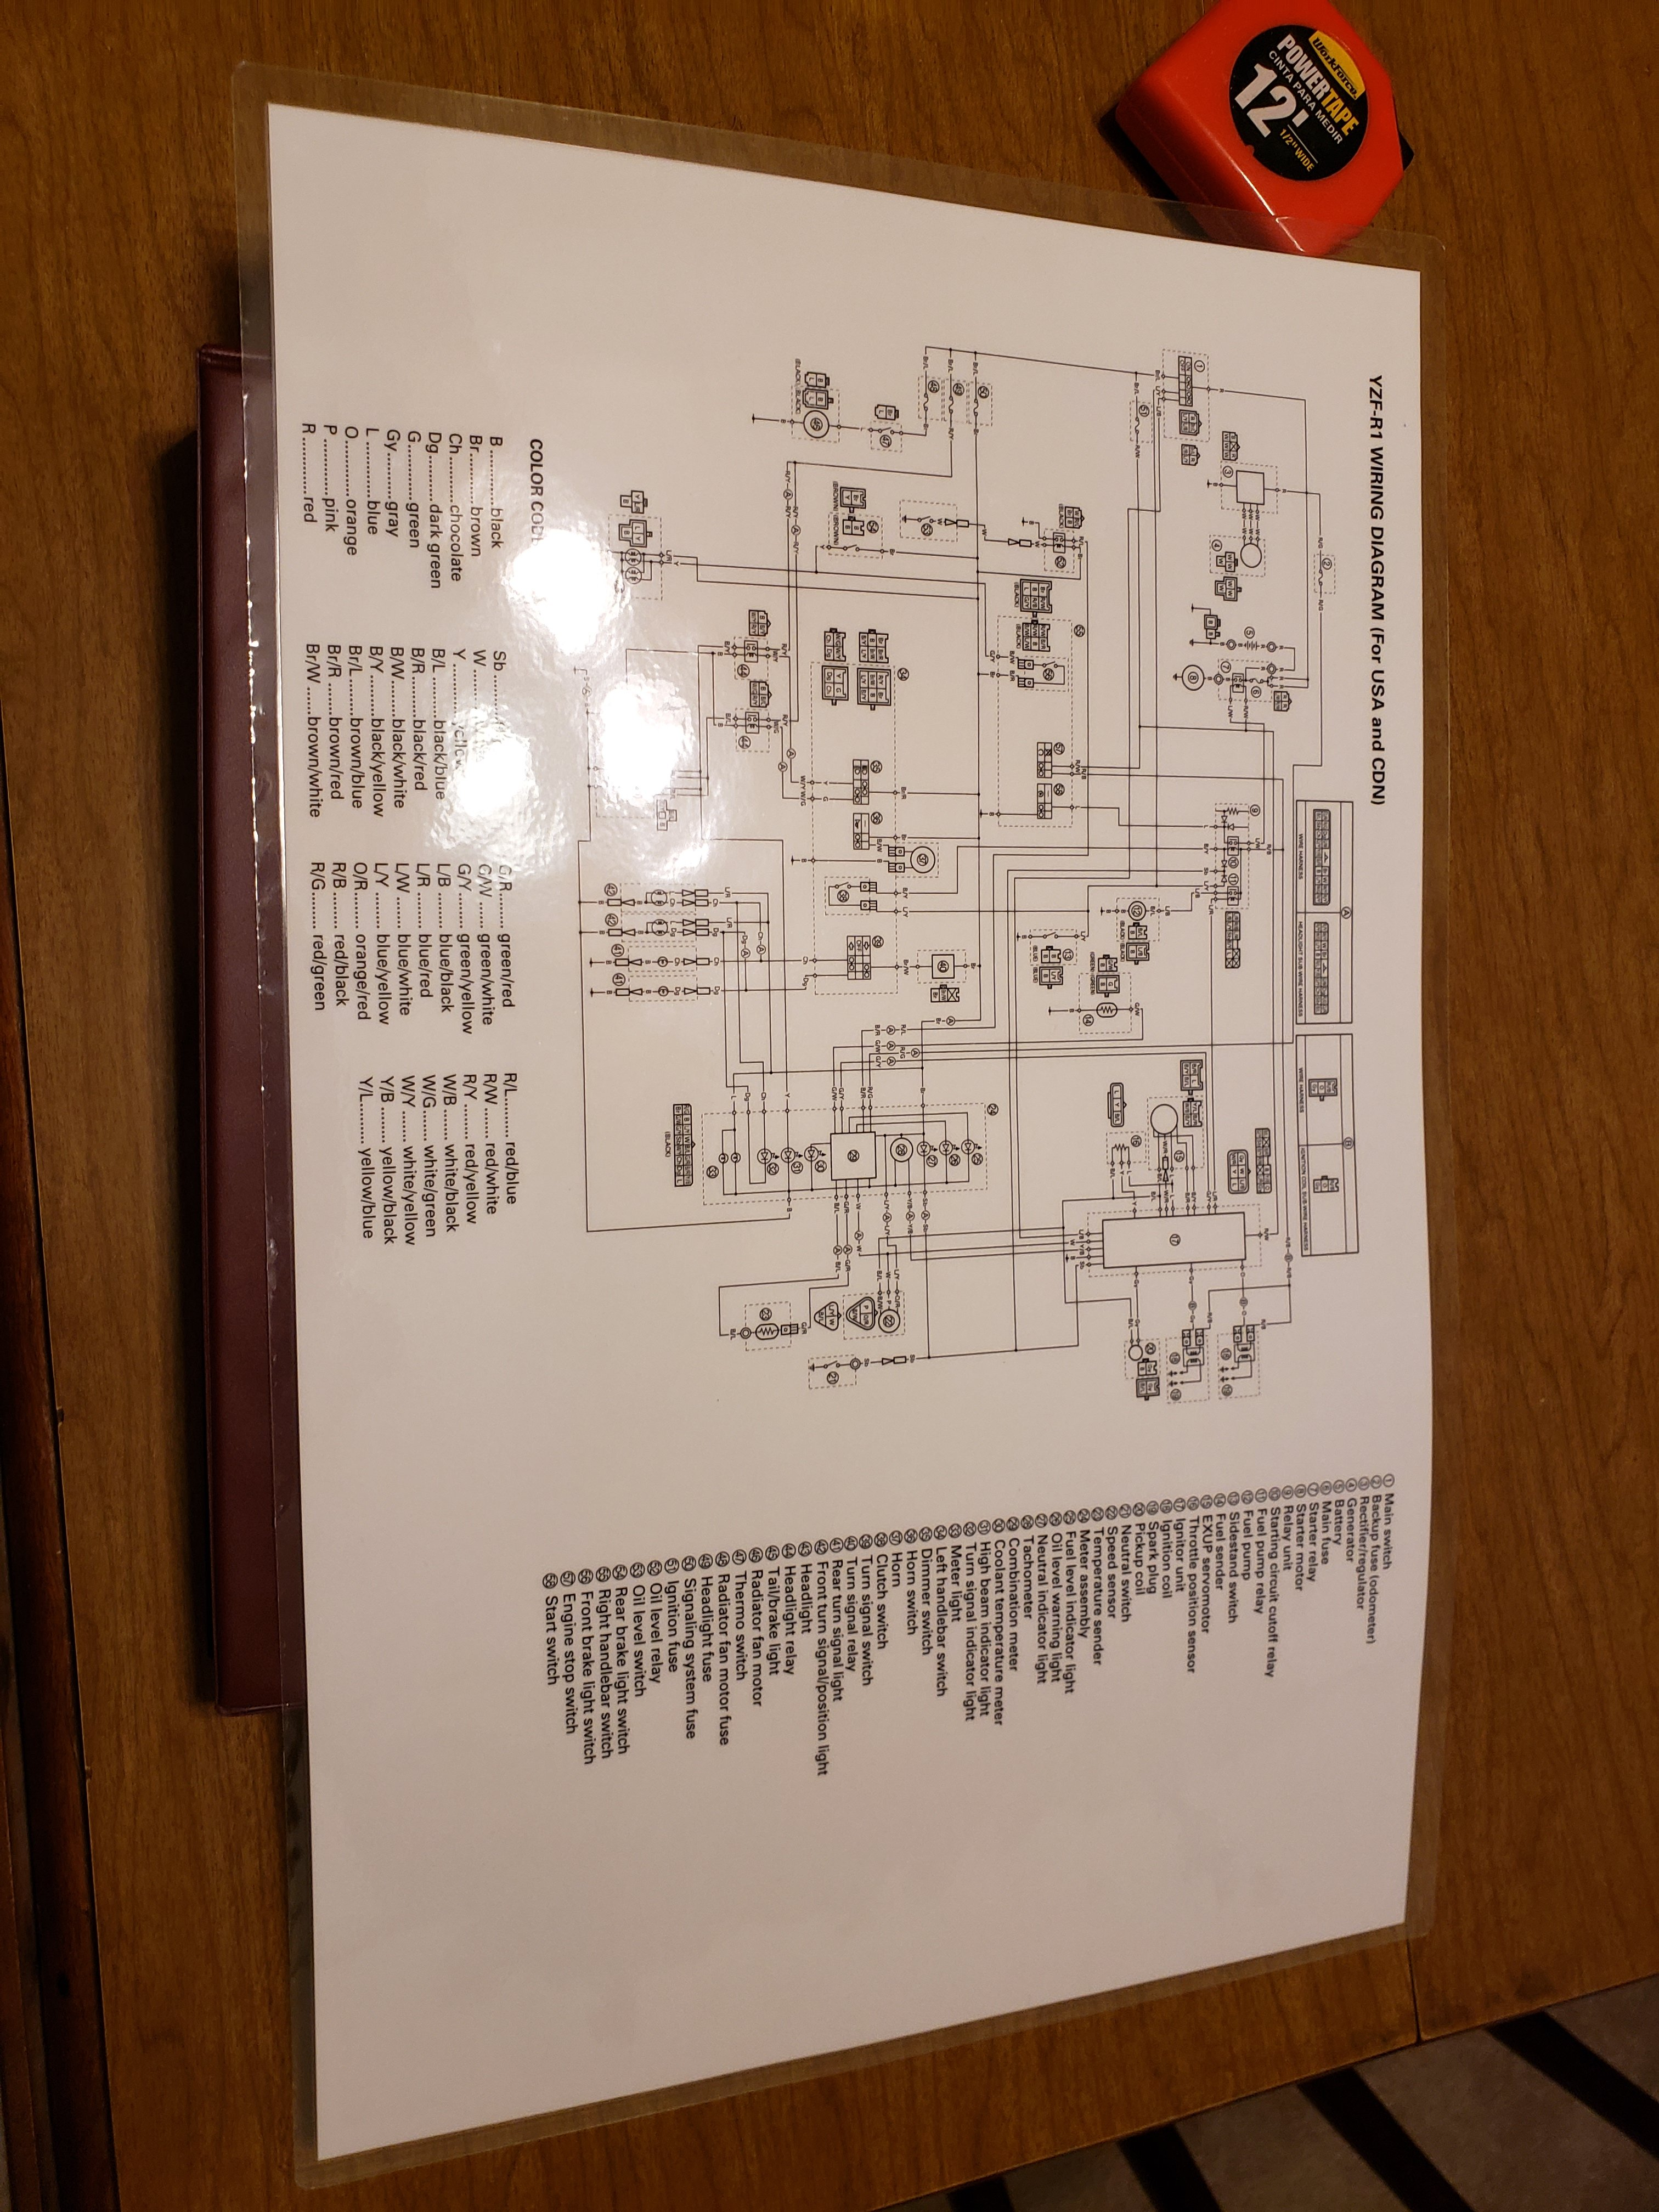 Get 08 Yamaha R1 Wiring Diagram Images